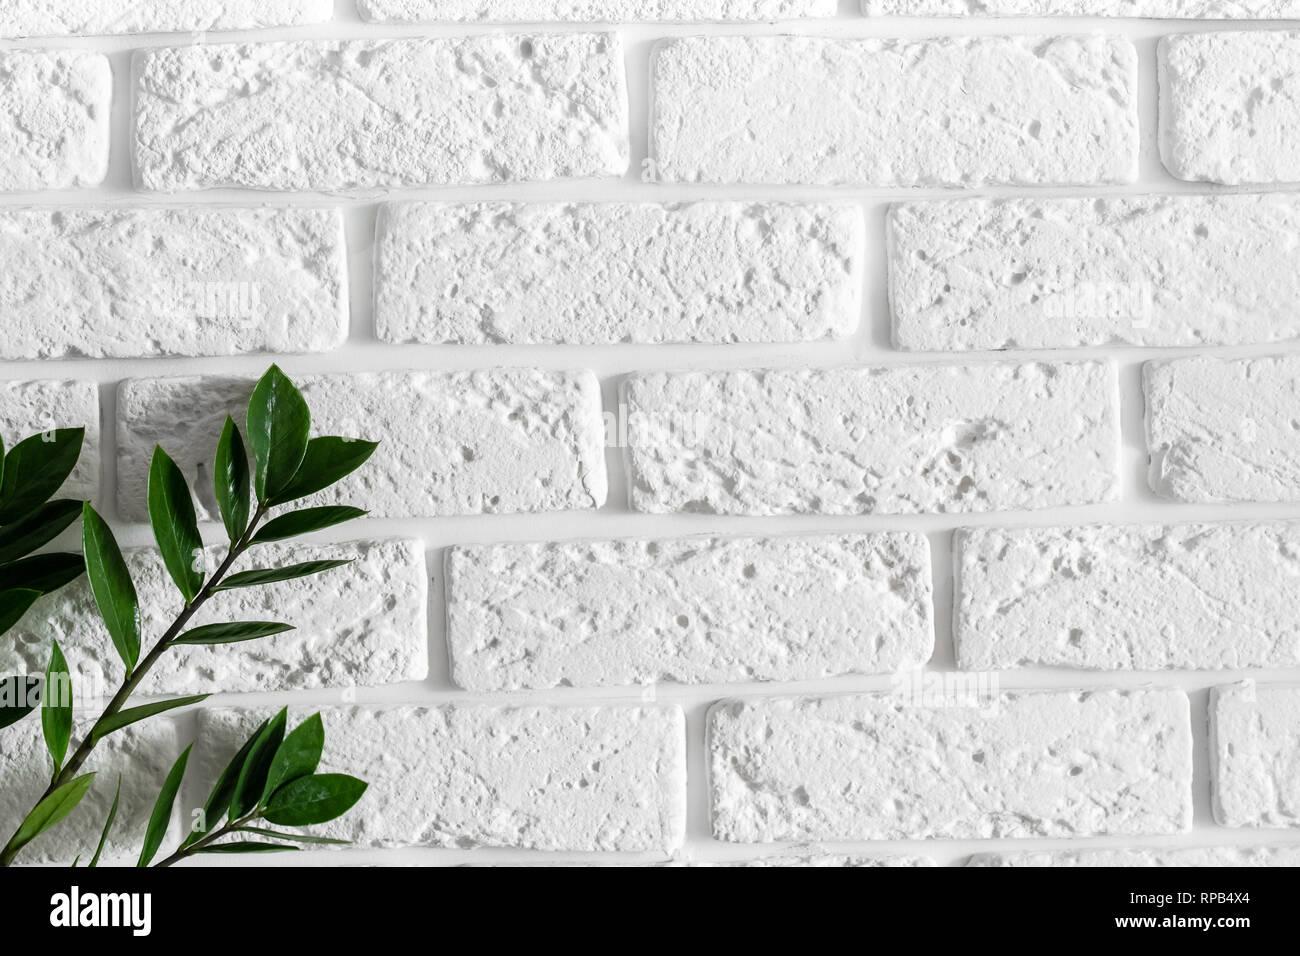 Green Plant Branch On White Brick Wall Modern Home Interior Design Background Stock Photo Alamy